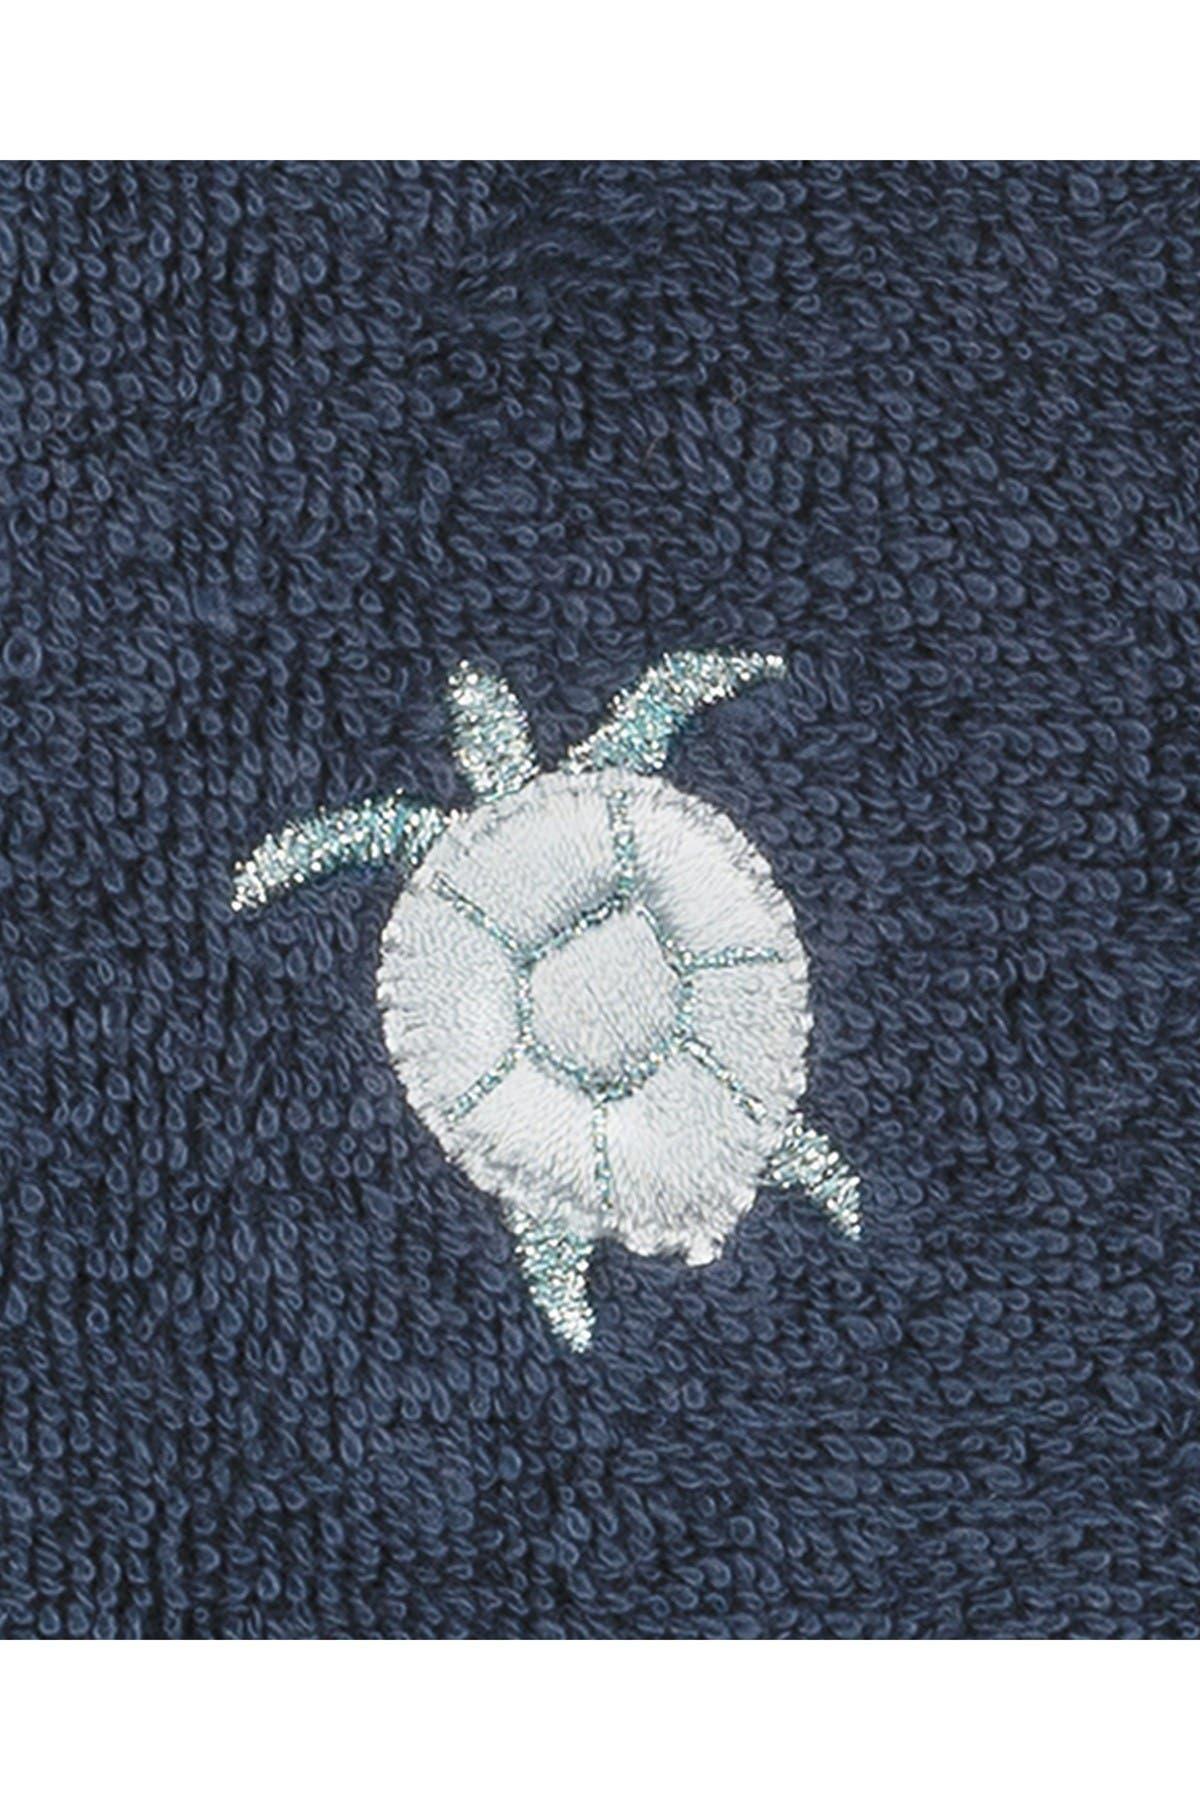 Image of LINUM HOME Ava Embellished Washcloth - Set of 2 - Midnight Blue